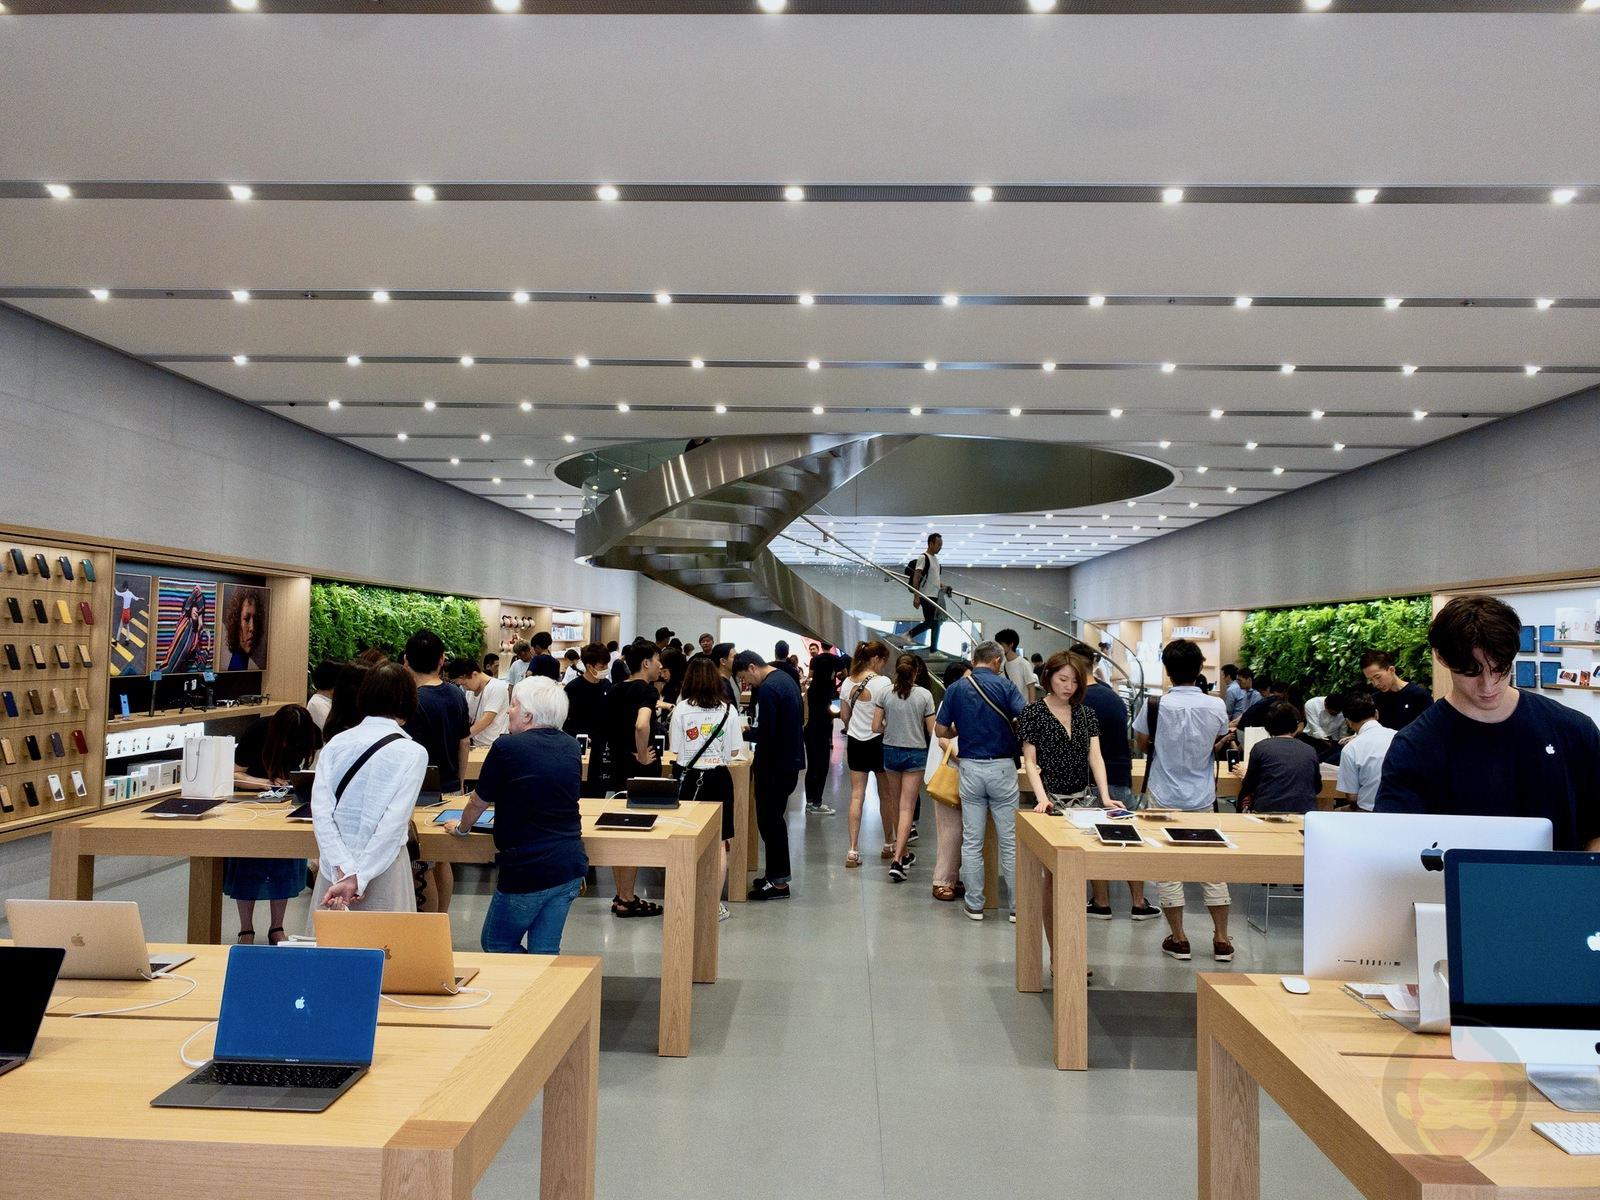 Apple Store Omotesando Basement floor renewal 16